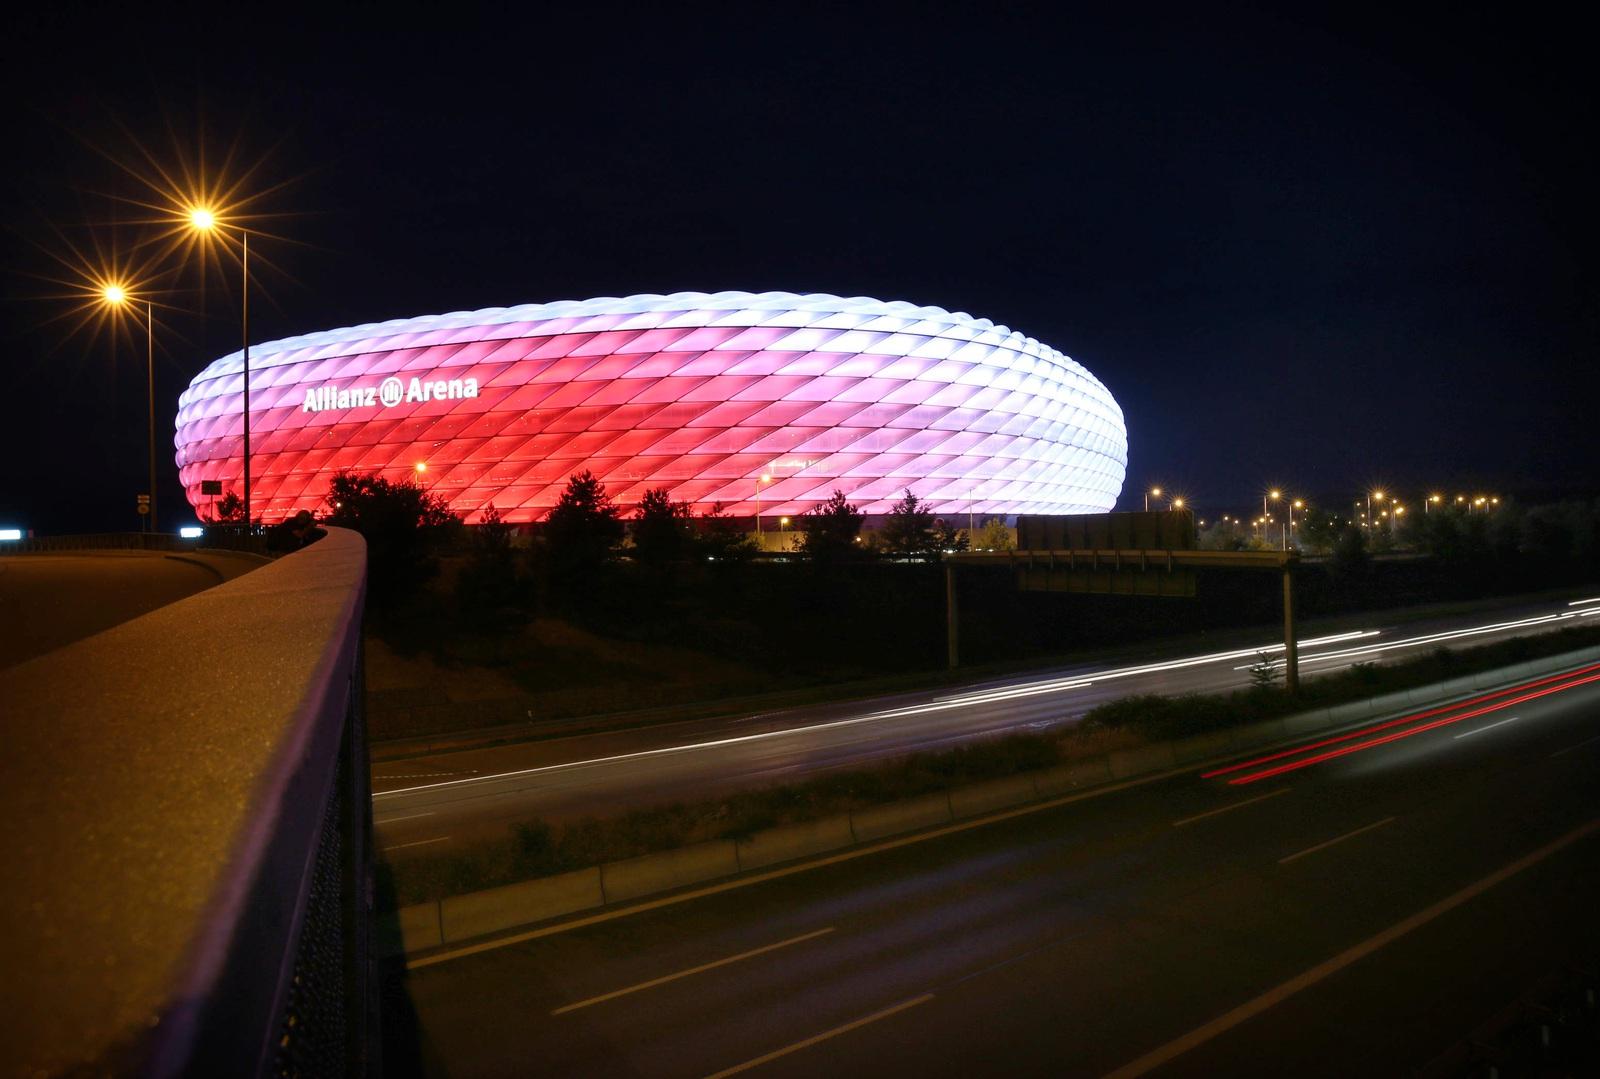 Neu in der Allianz Arena: Beleuchtung, Hawk-Eye, Spuckschutz | FC Bayern